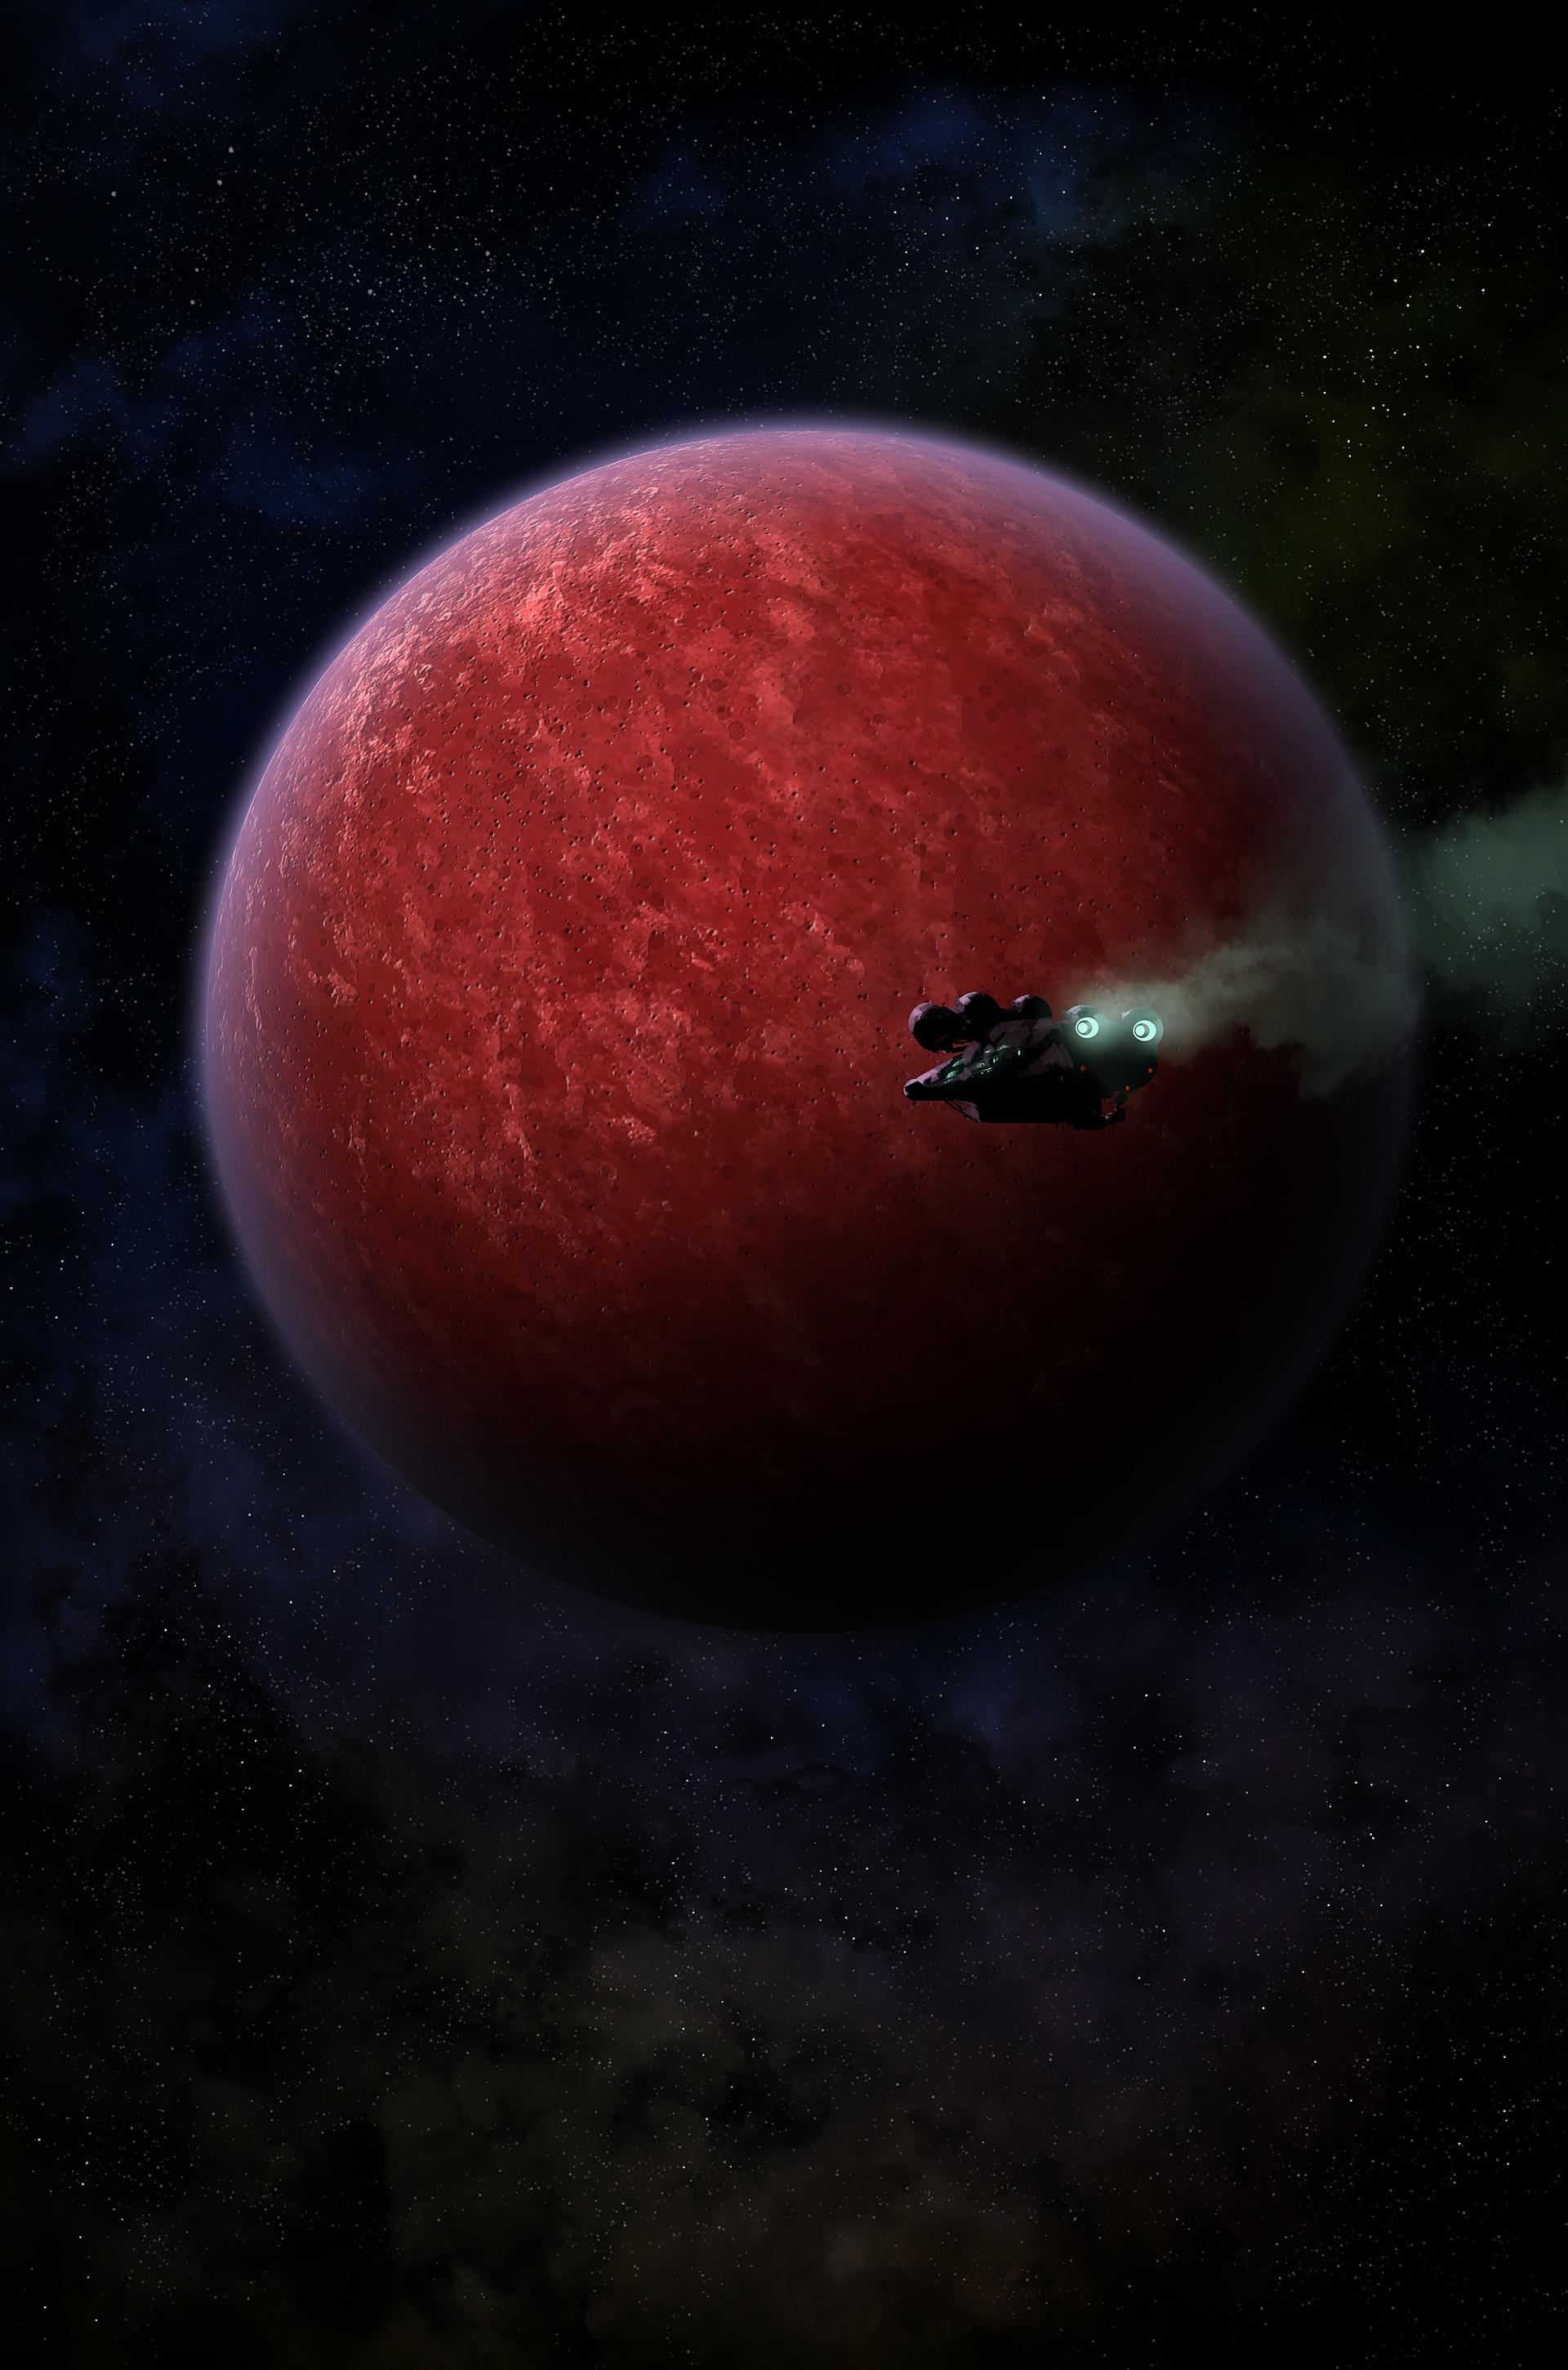 Pierre santamaria planet red moon copie